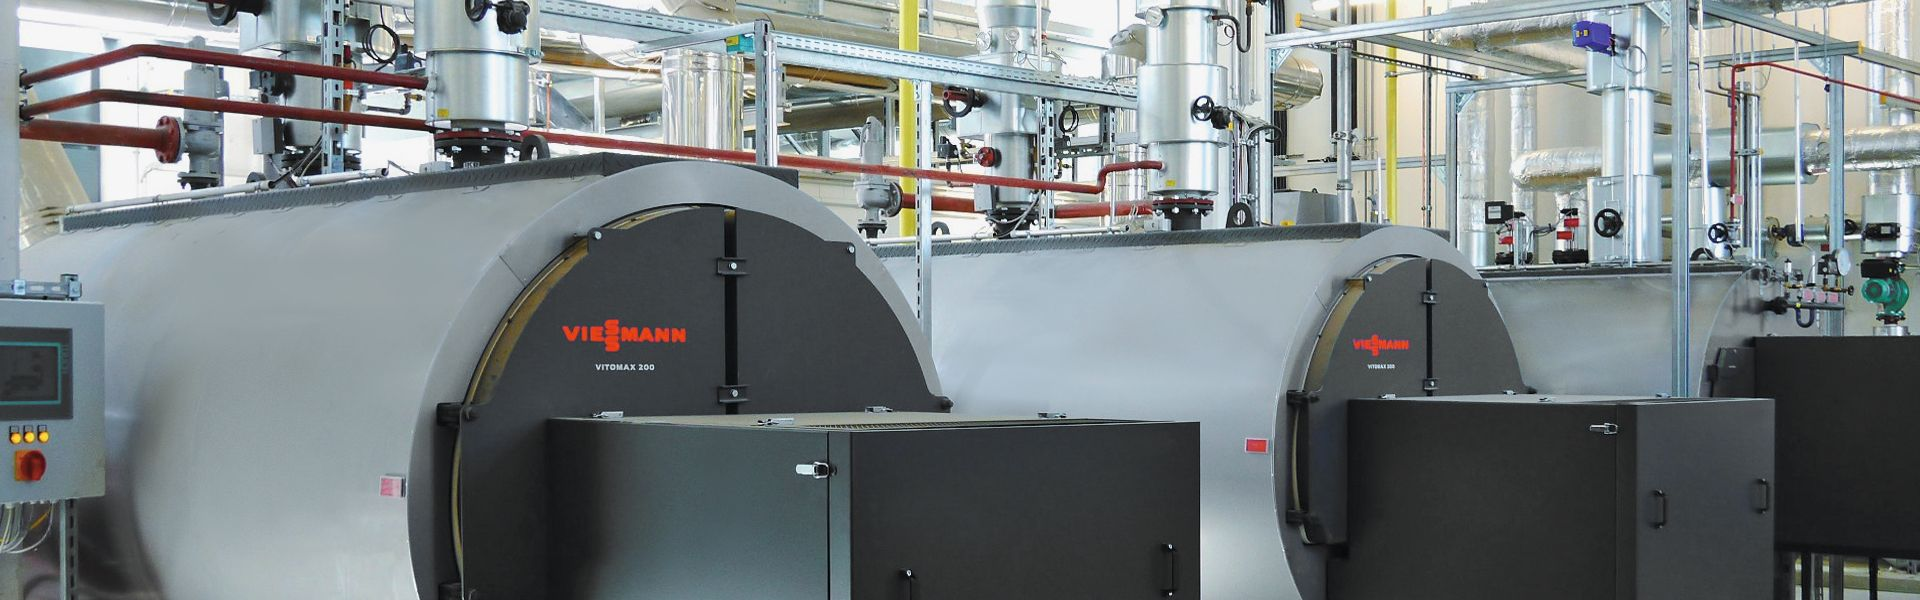 generatori-di-vapore-industriali-compressor